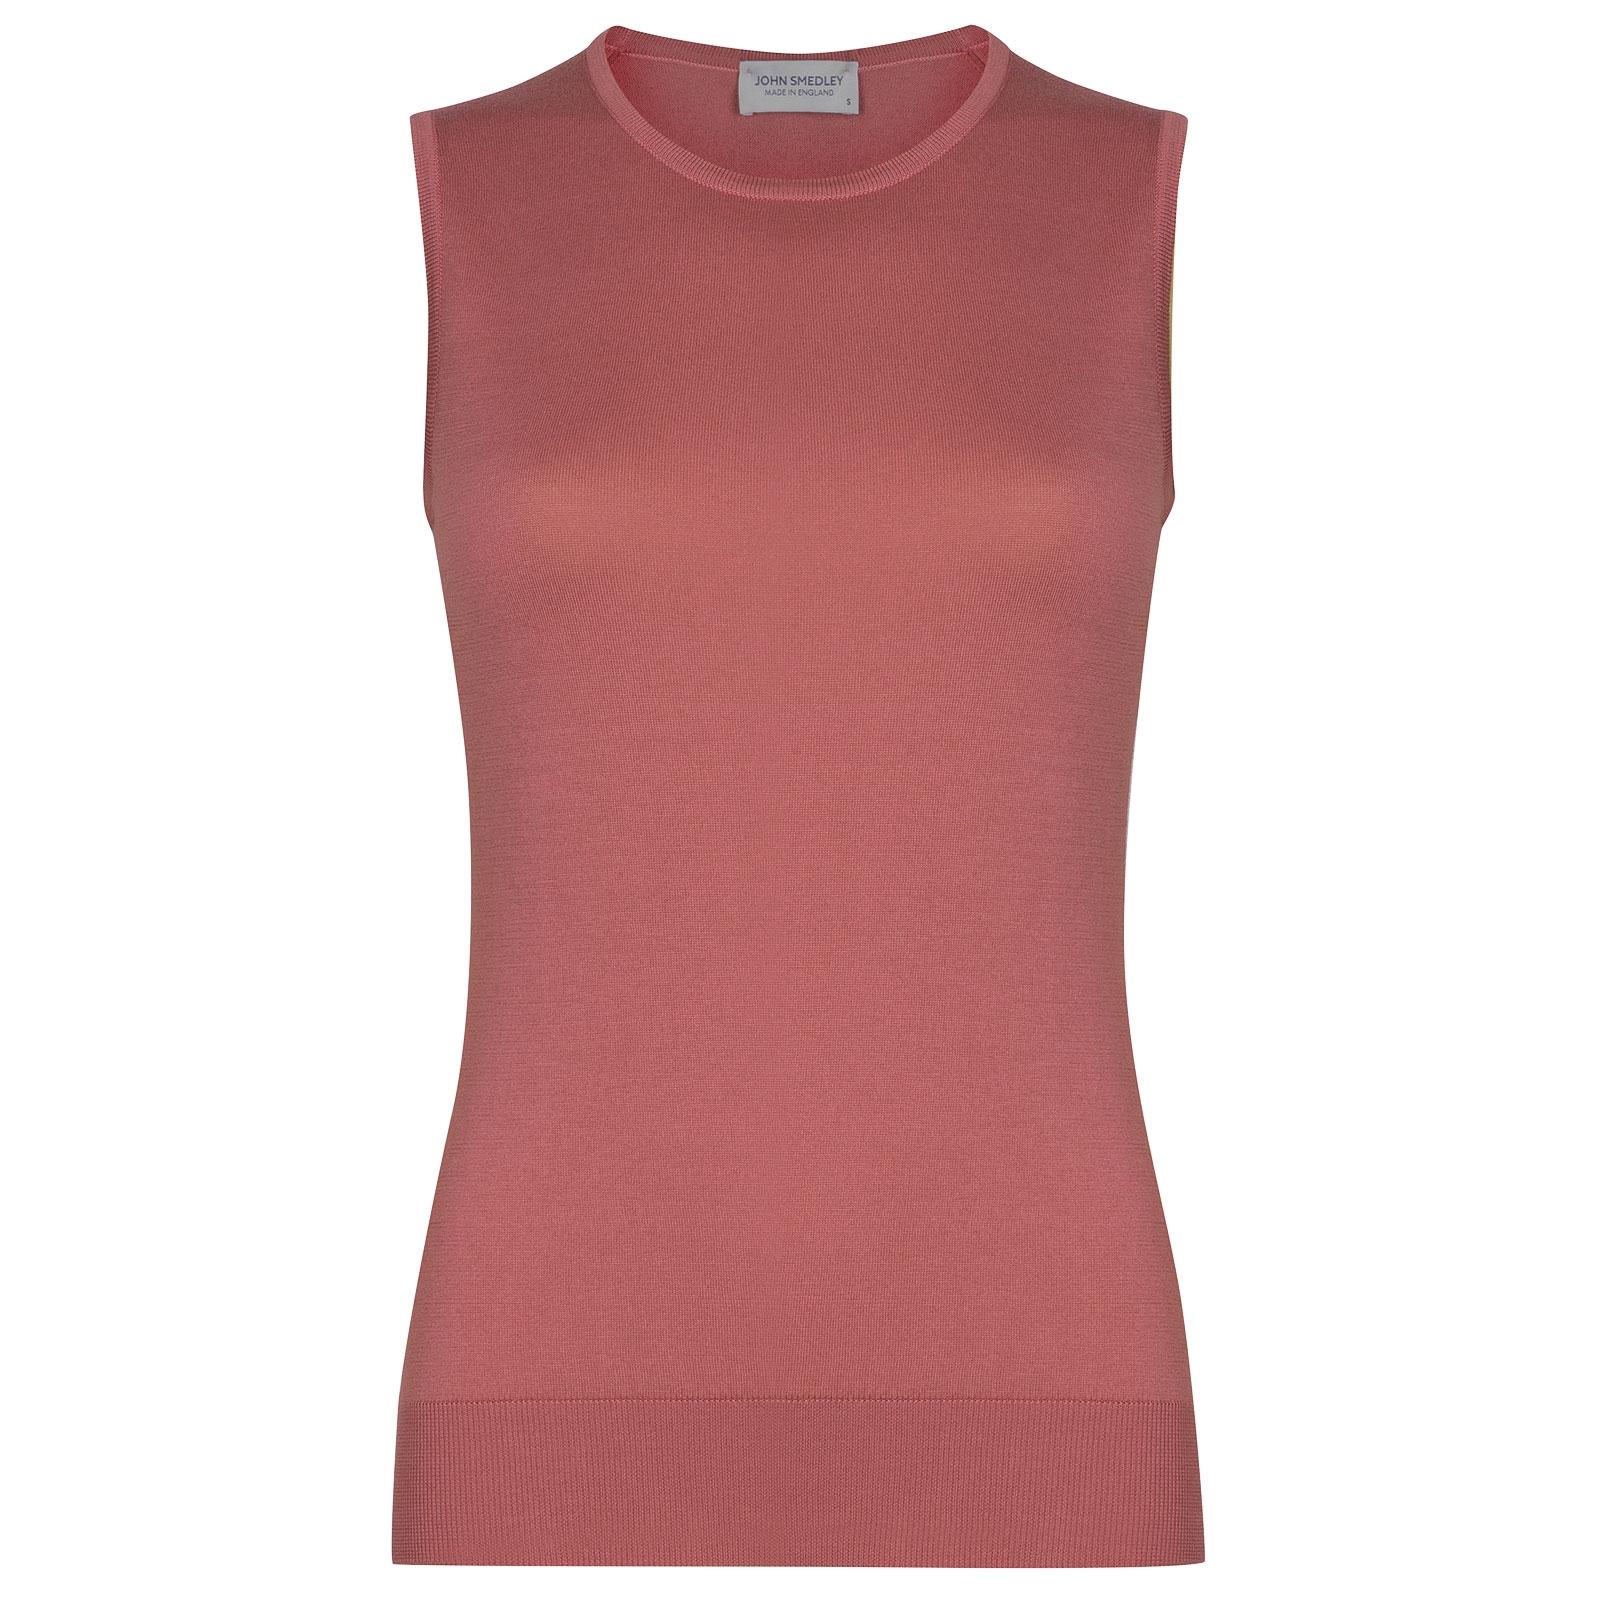 John Smedley Highgate in Azalea Pink Sweater-MED